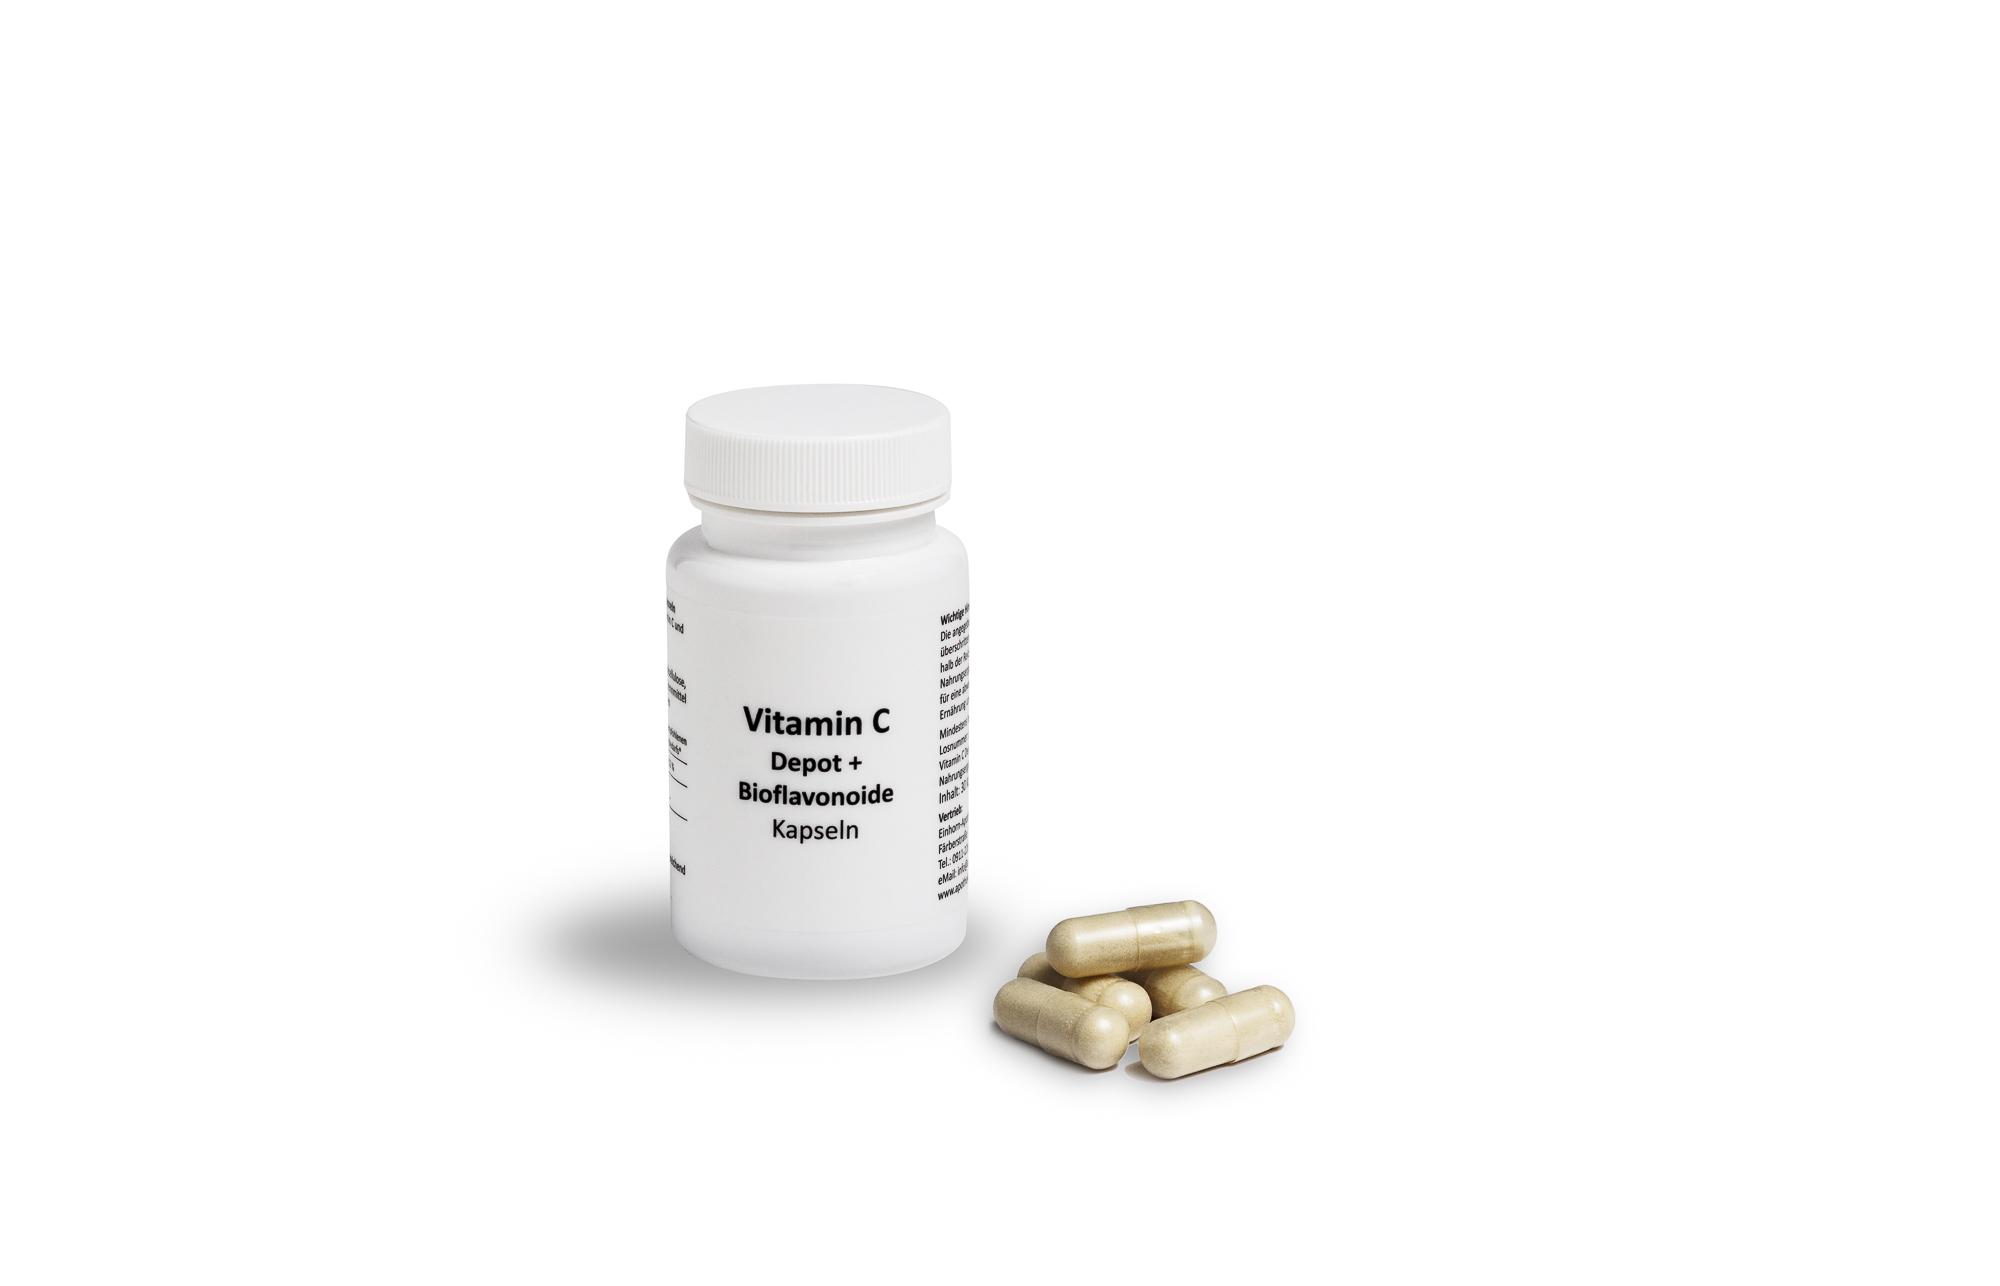 Vitamin C depot + Bioflavonoide Kapseln